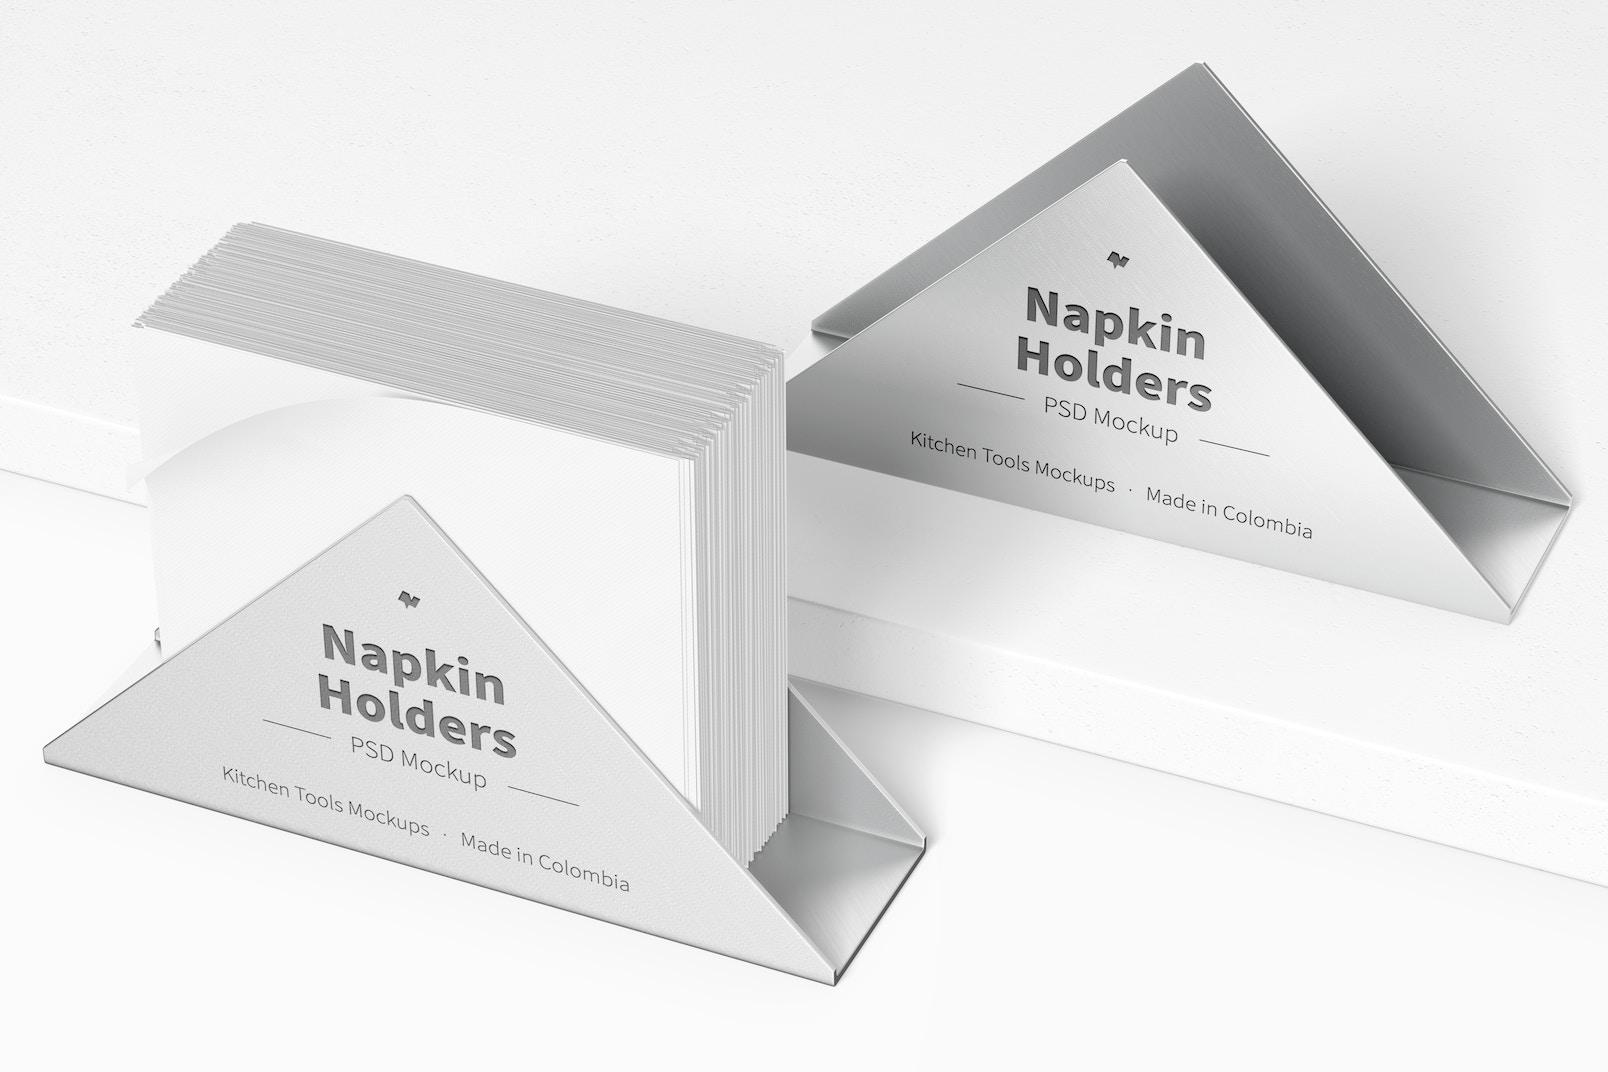 Napkin Holders Mockup, Perspective View